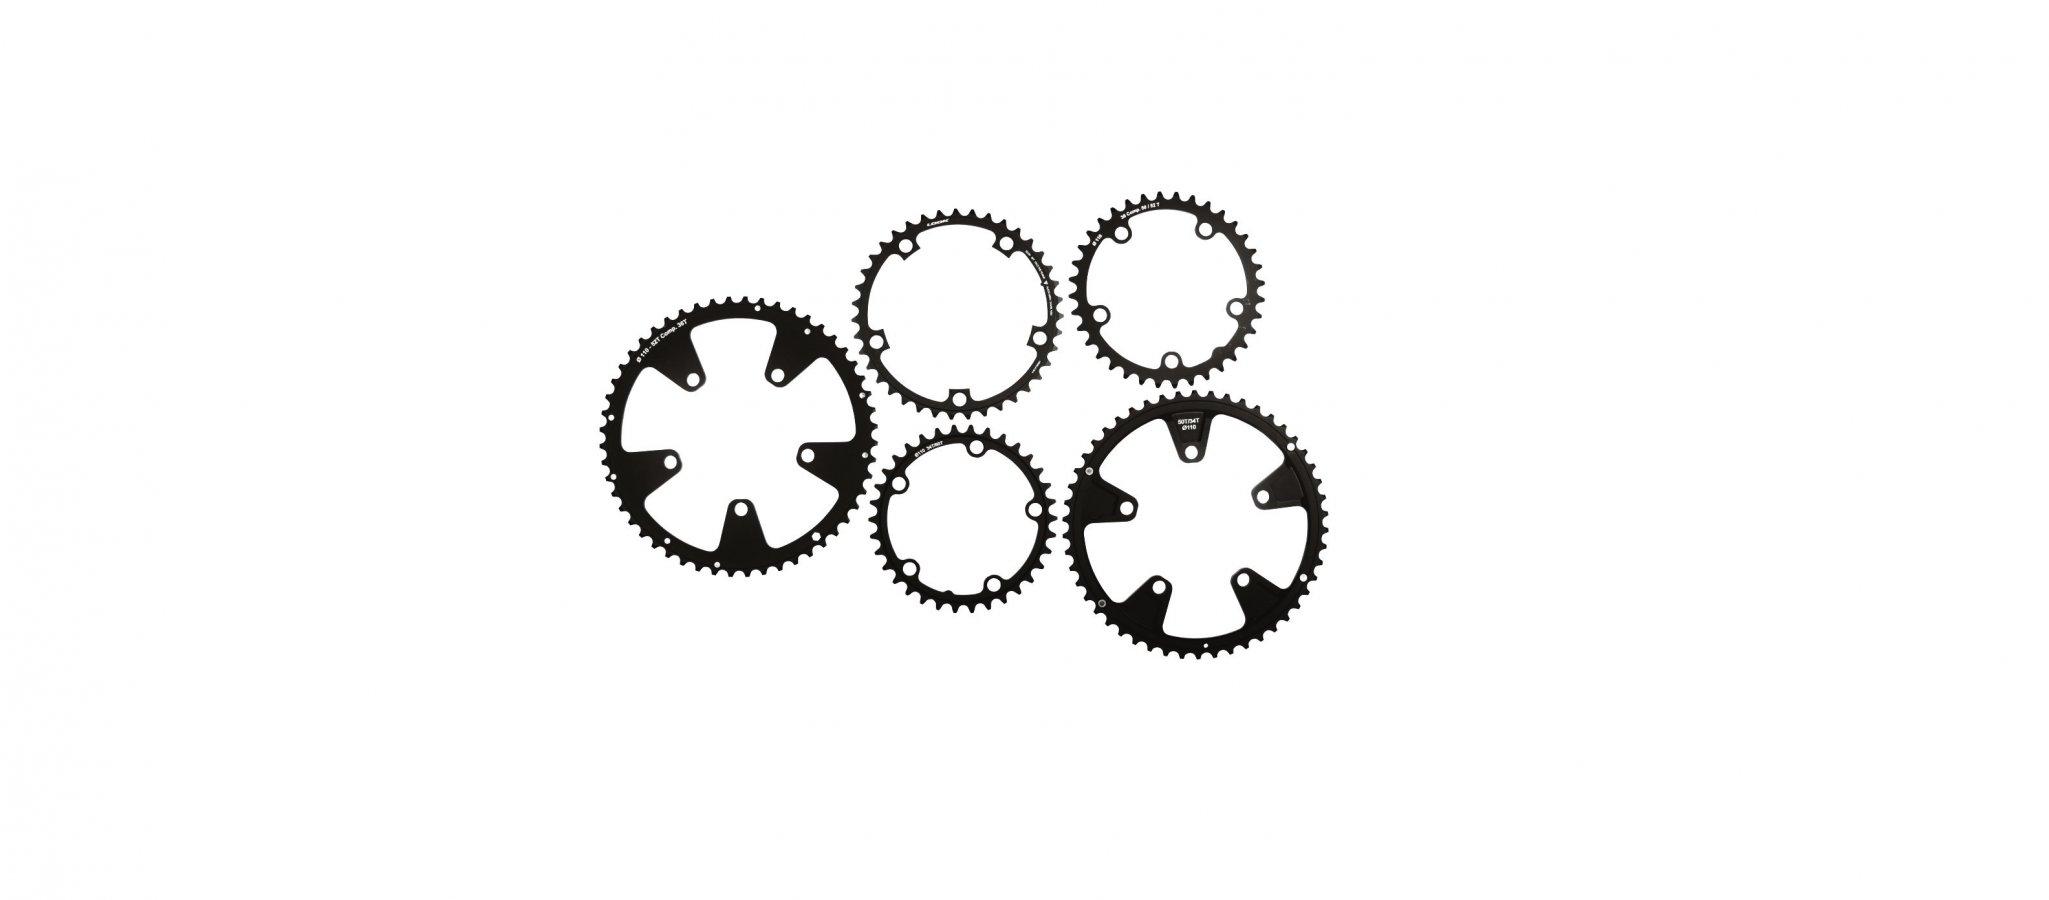 zed-3-chainring